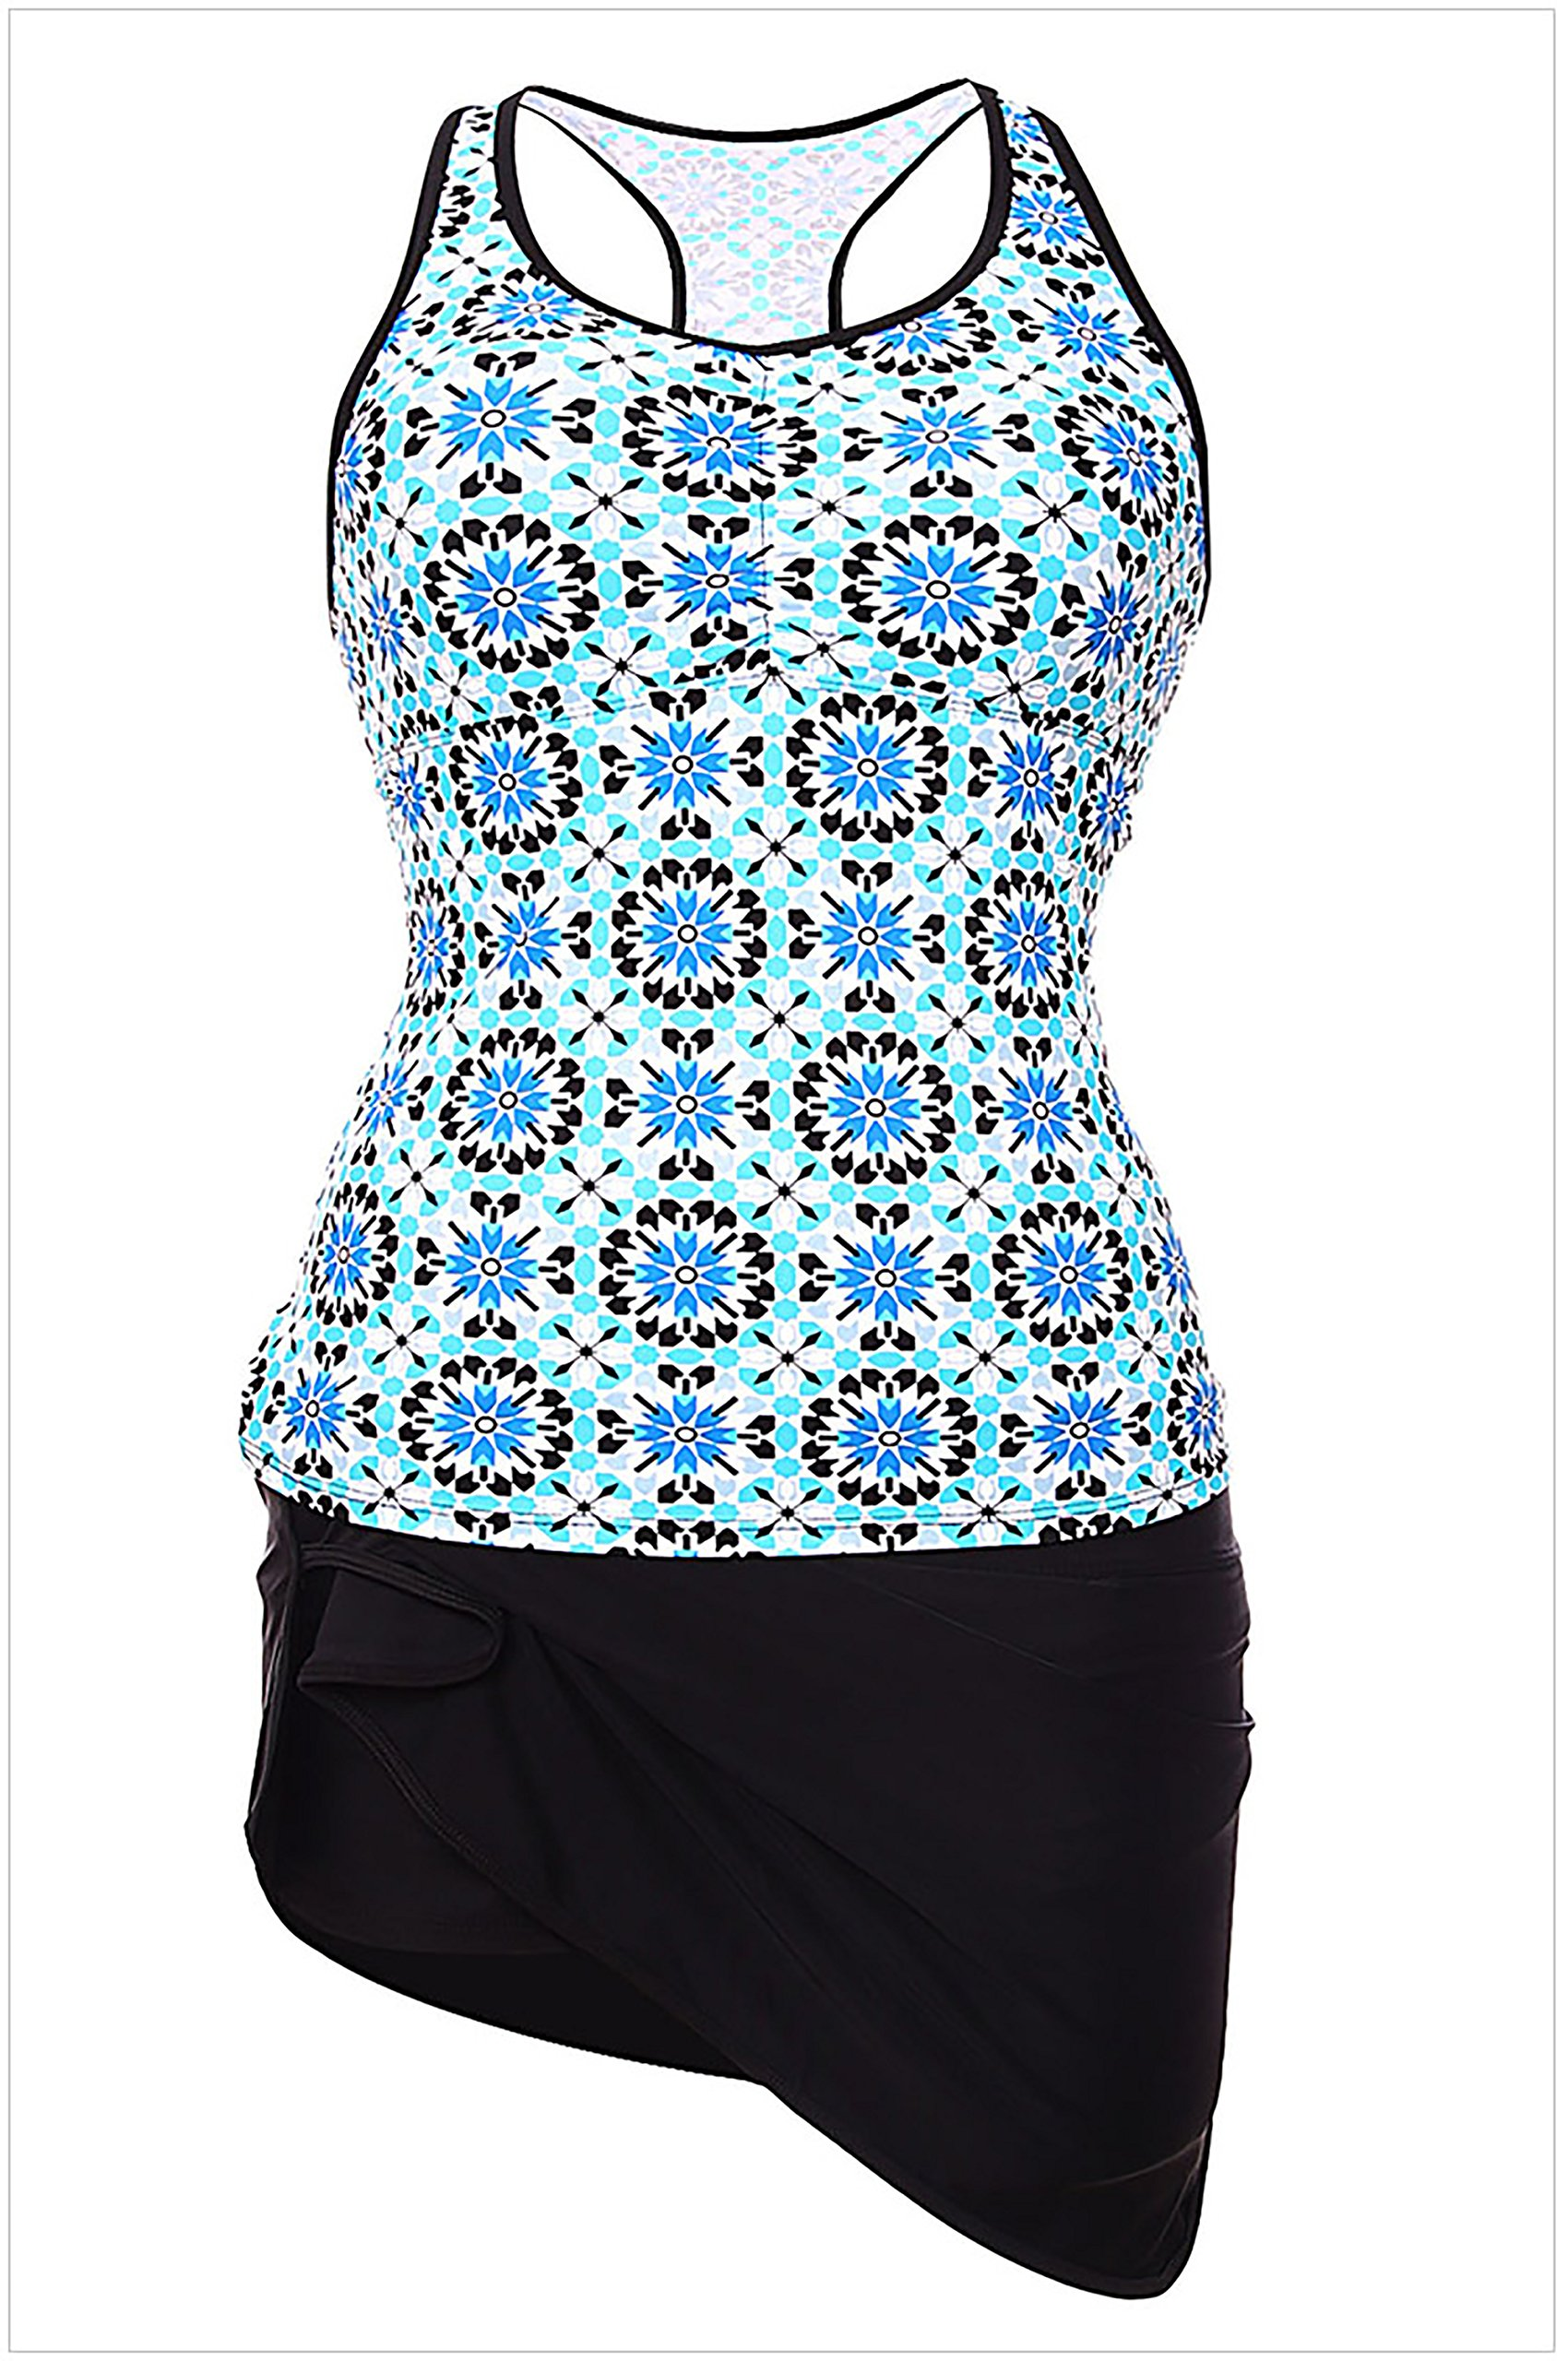 FlyMaff Abstract Print Racerback Tankini Blue Skort Swimsuit(Wathet L)